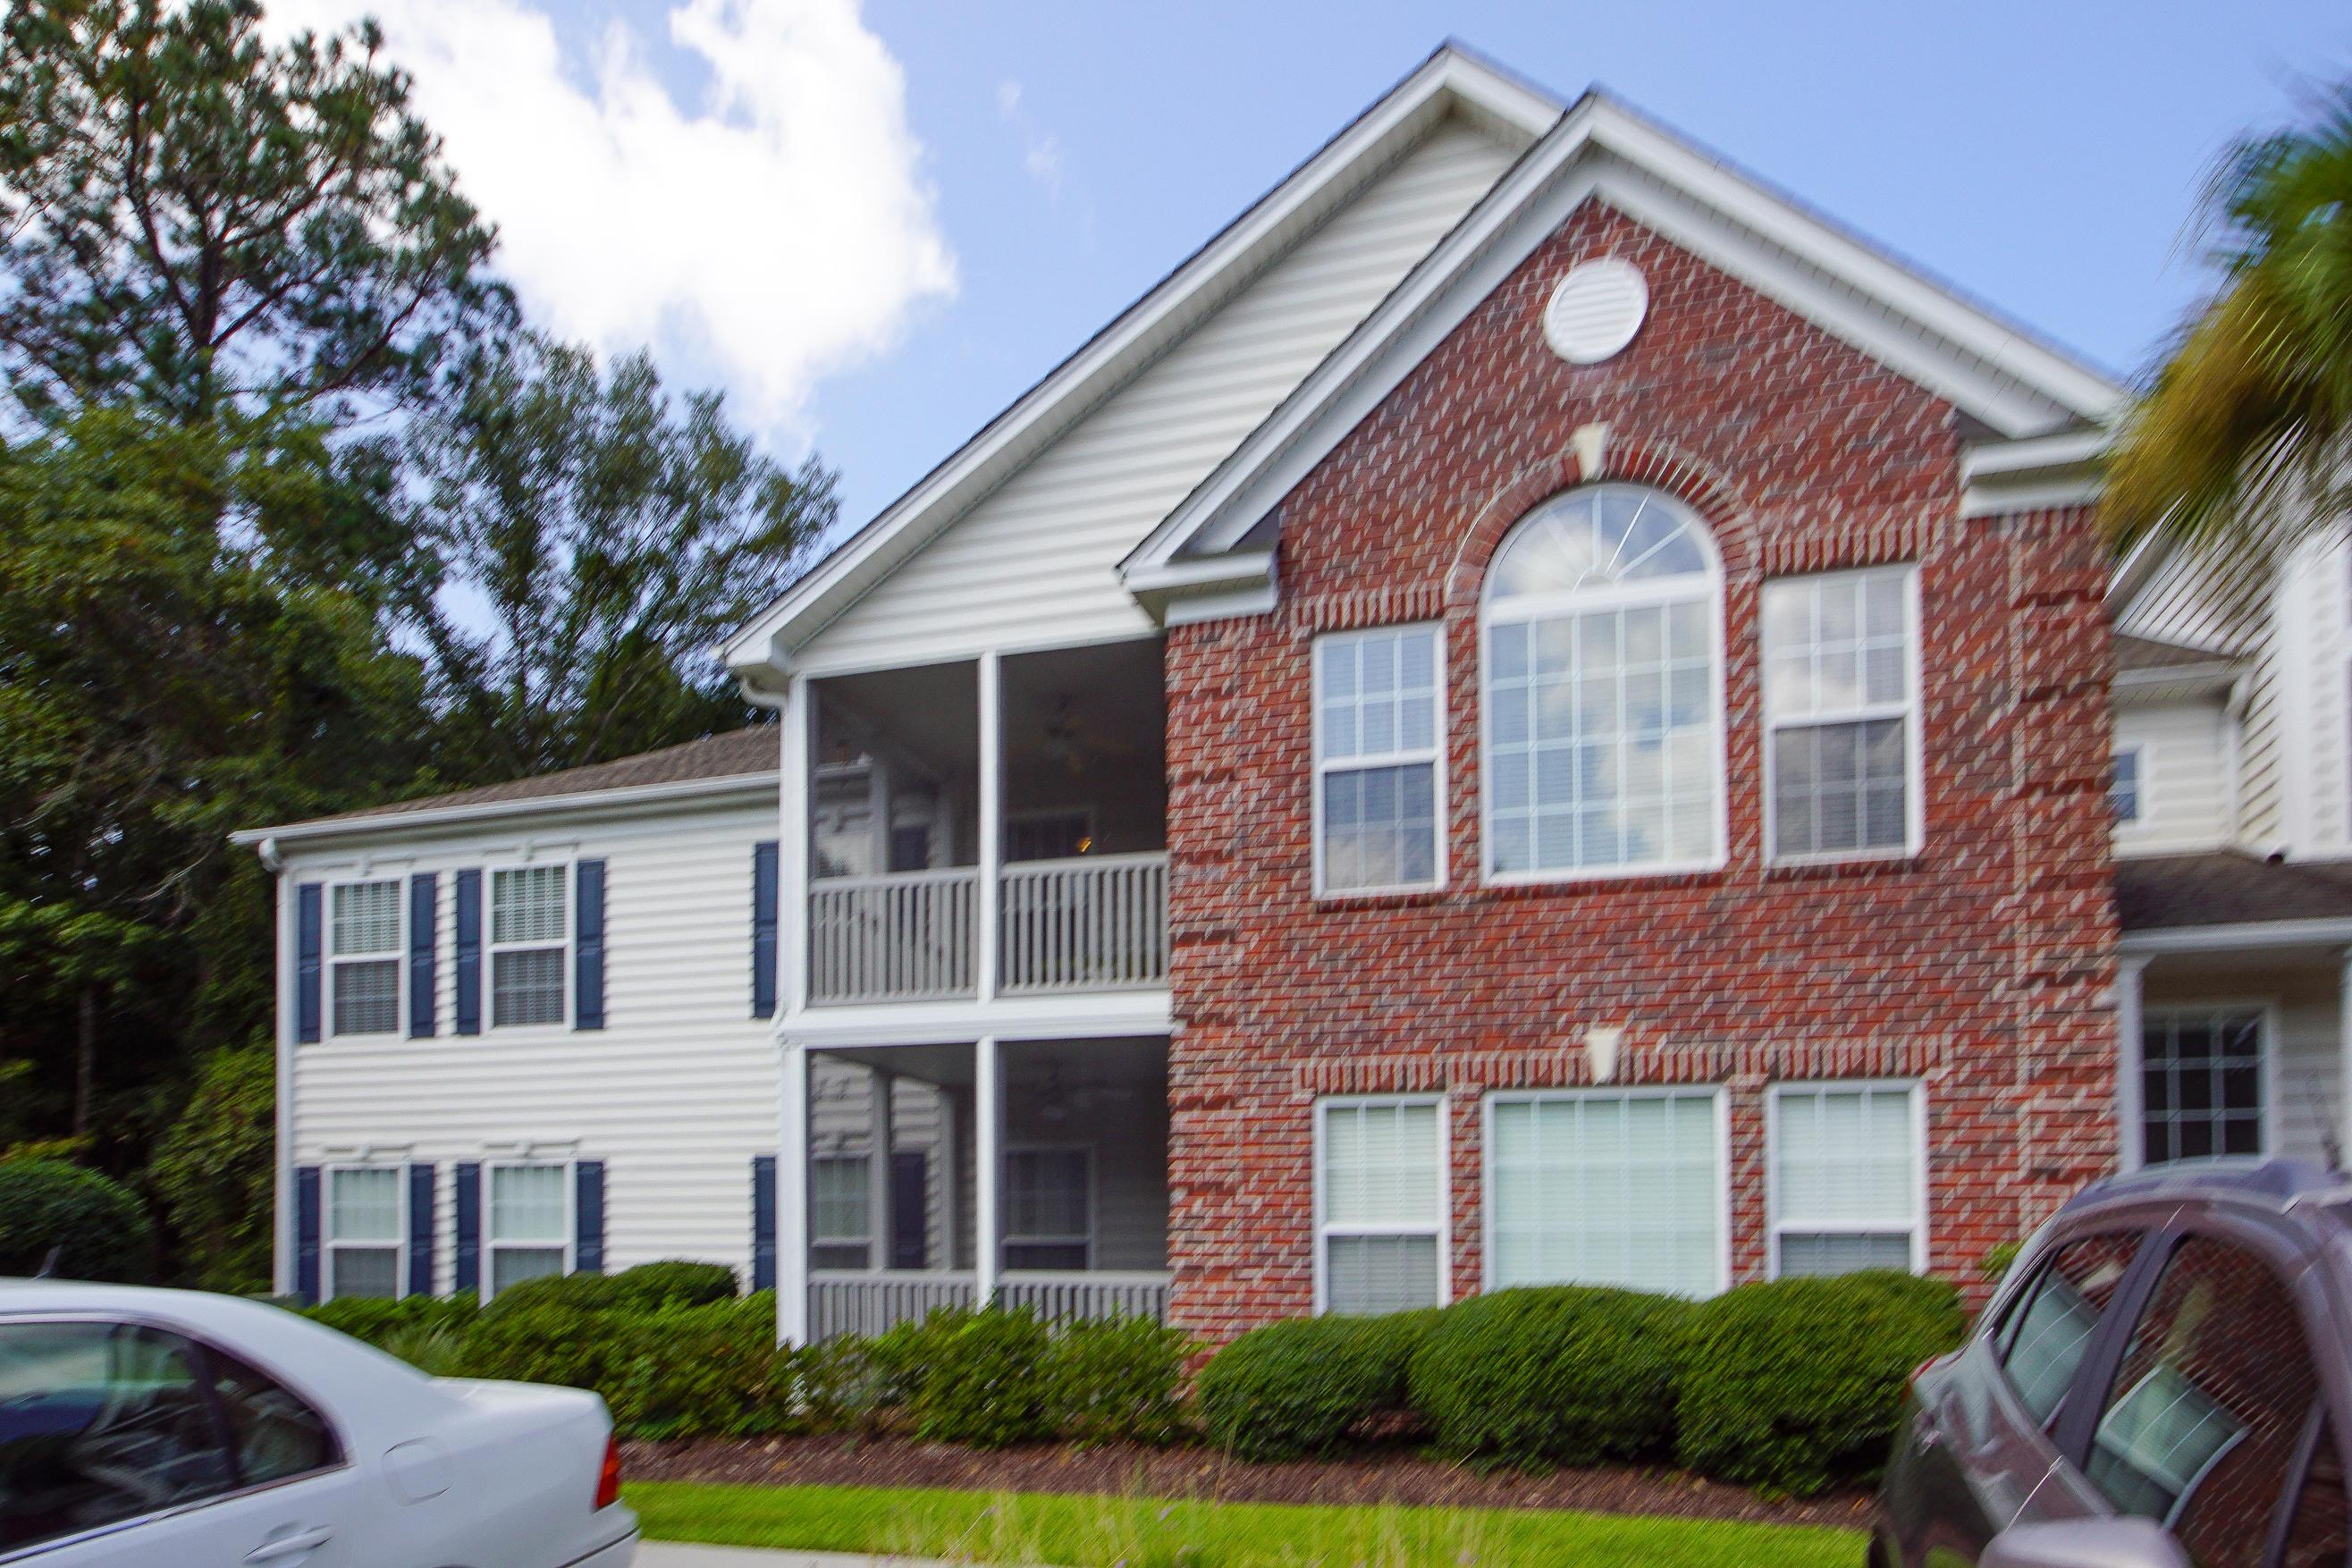 Dunes West Homes For Sale - 1631 Camfield, Mount Pleasant, SC - 21